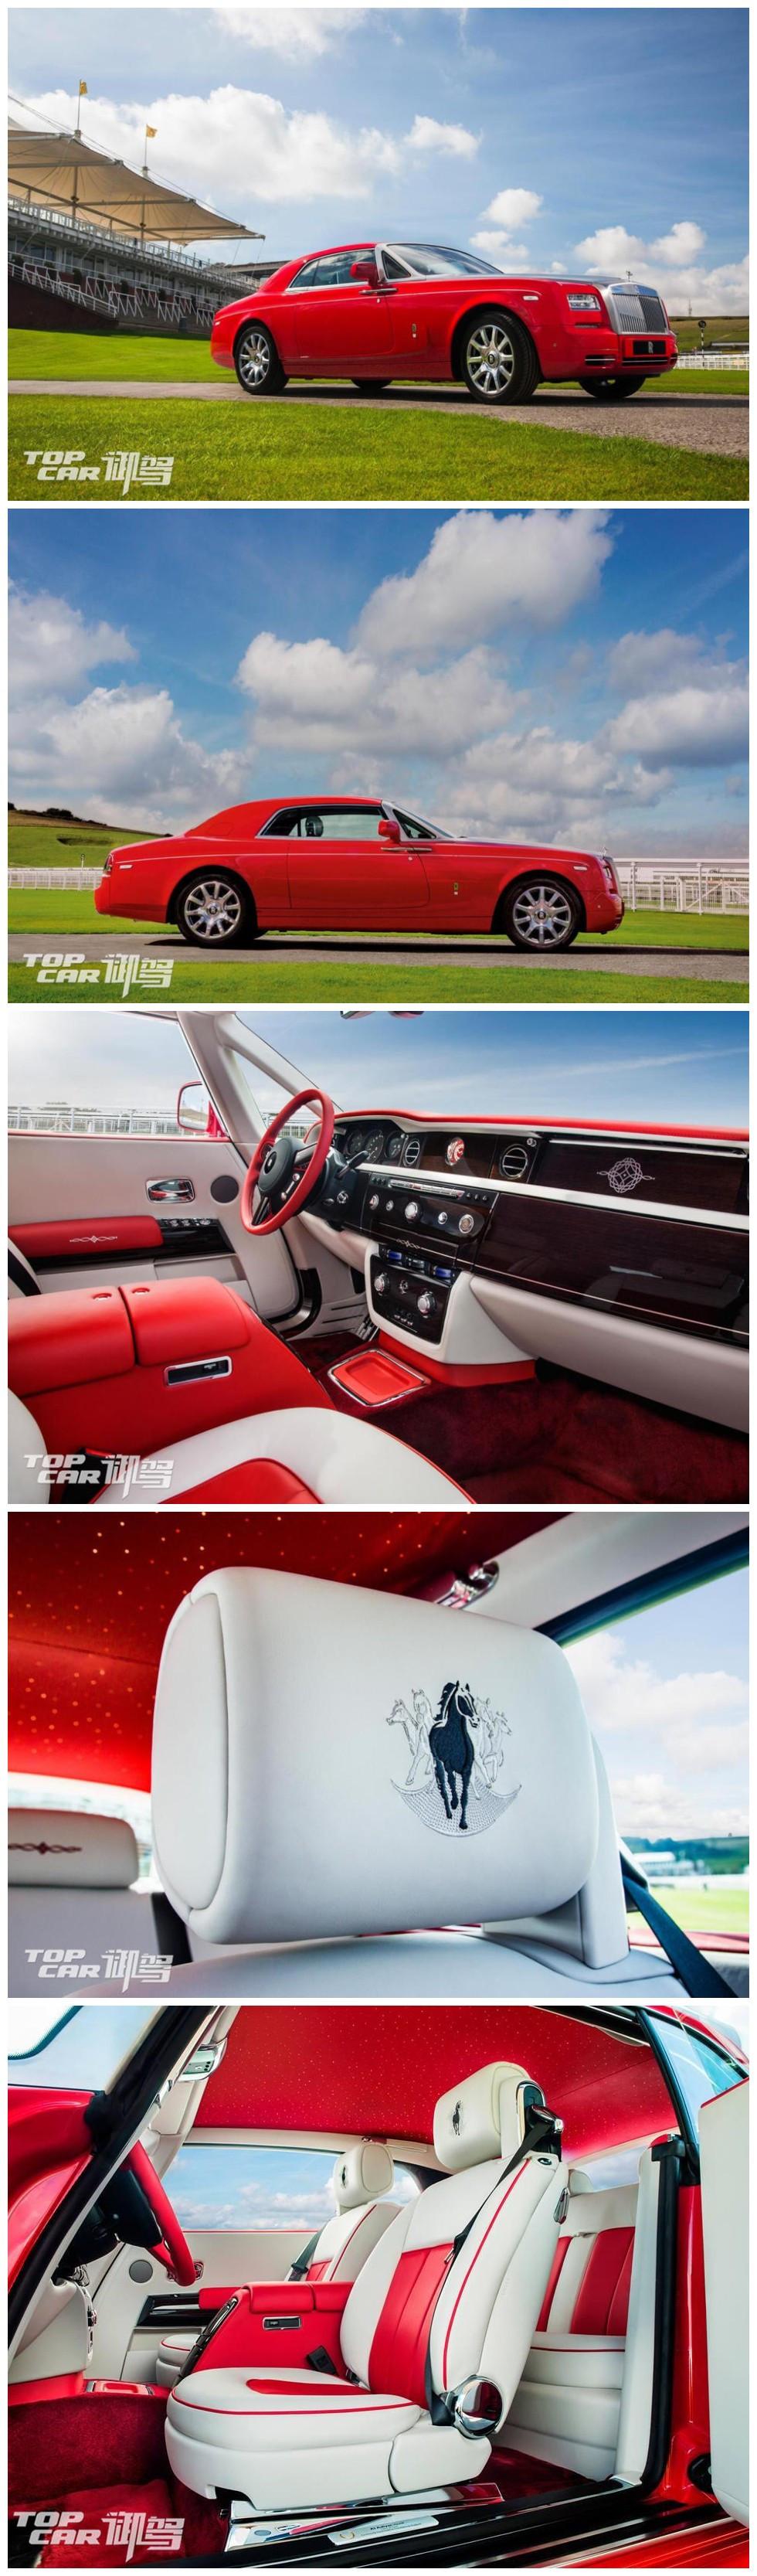 Rolls Royce Phantom Coupe Al Adiyat limited one cars